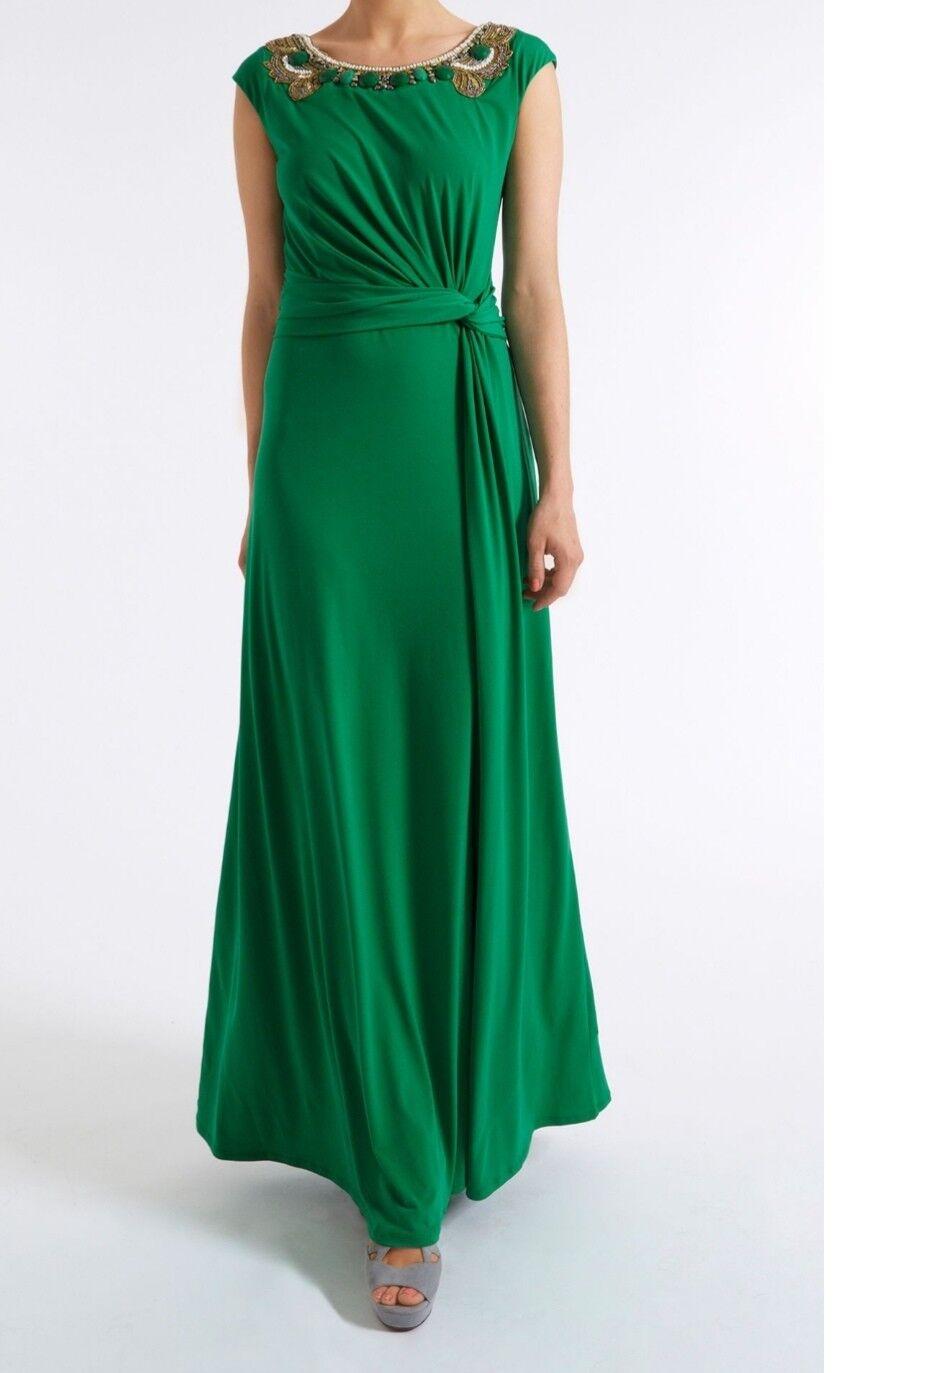 Almost famous Grün embellised maxi dress Größe 12 bnw